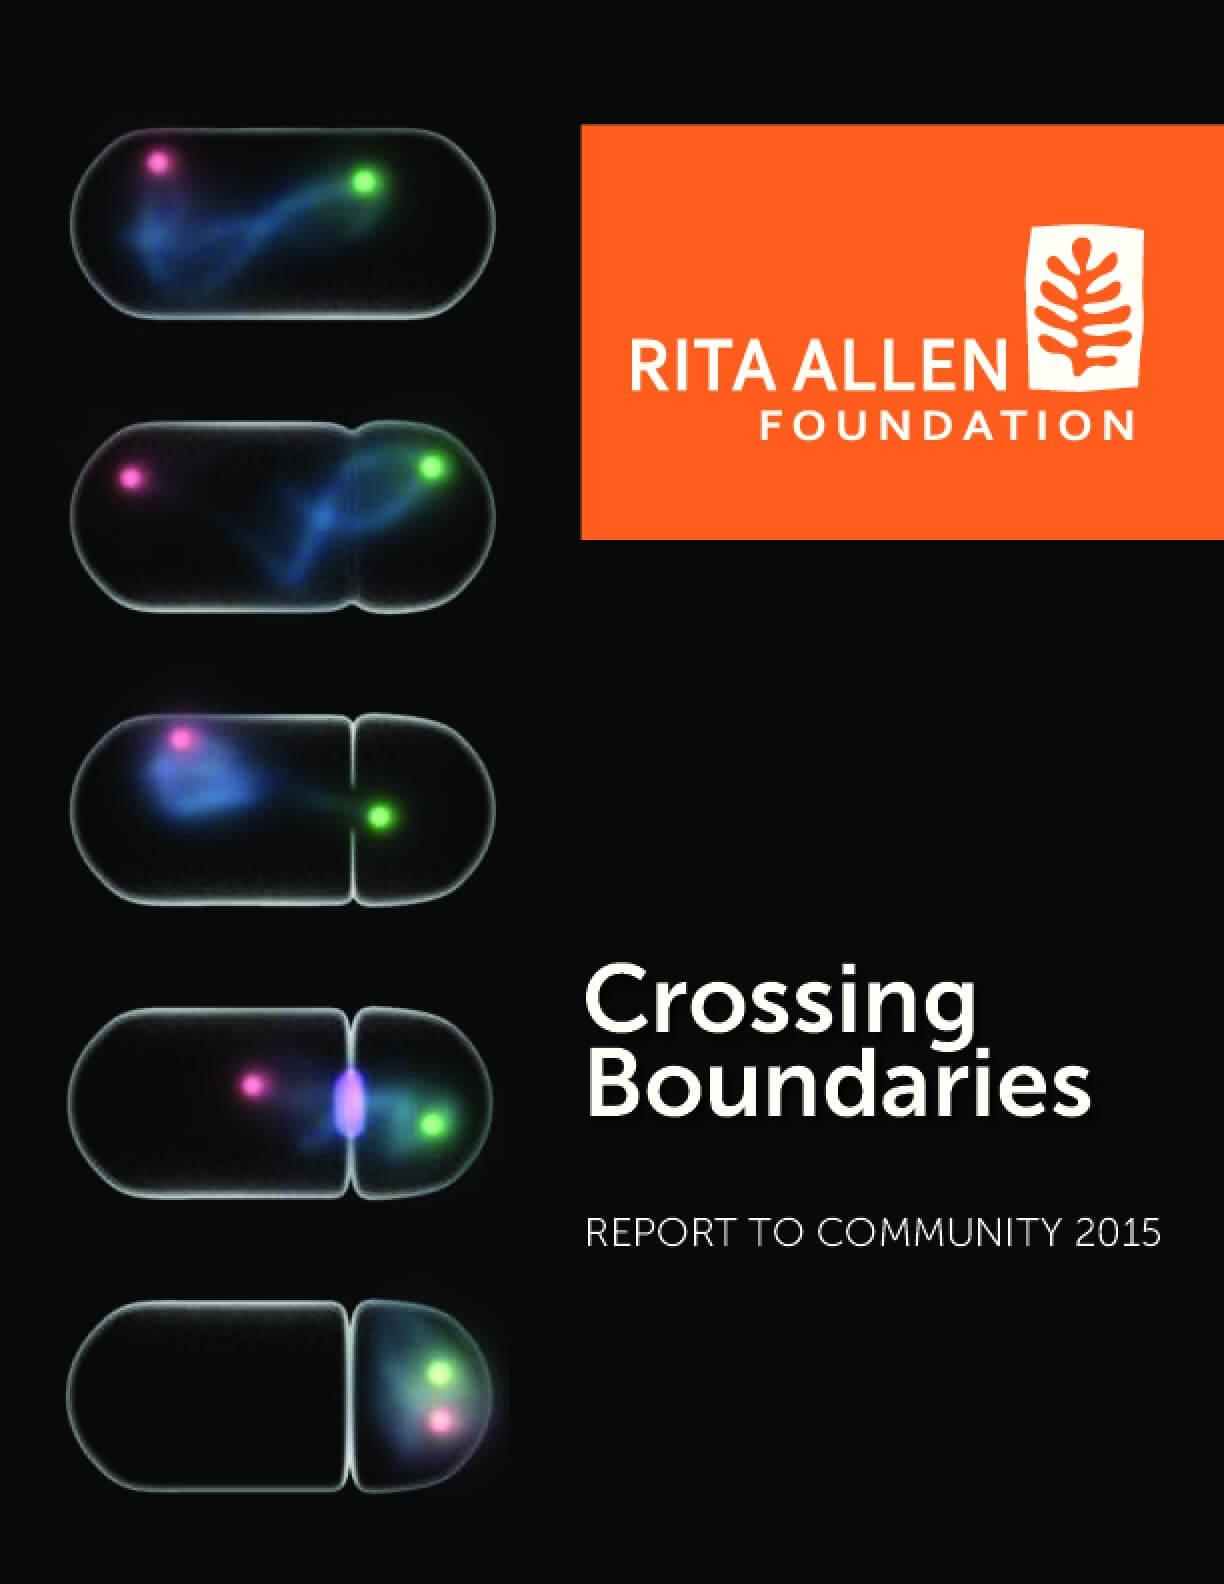 Crossing Boundaries: Report to Community 2015